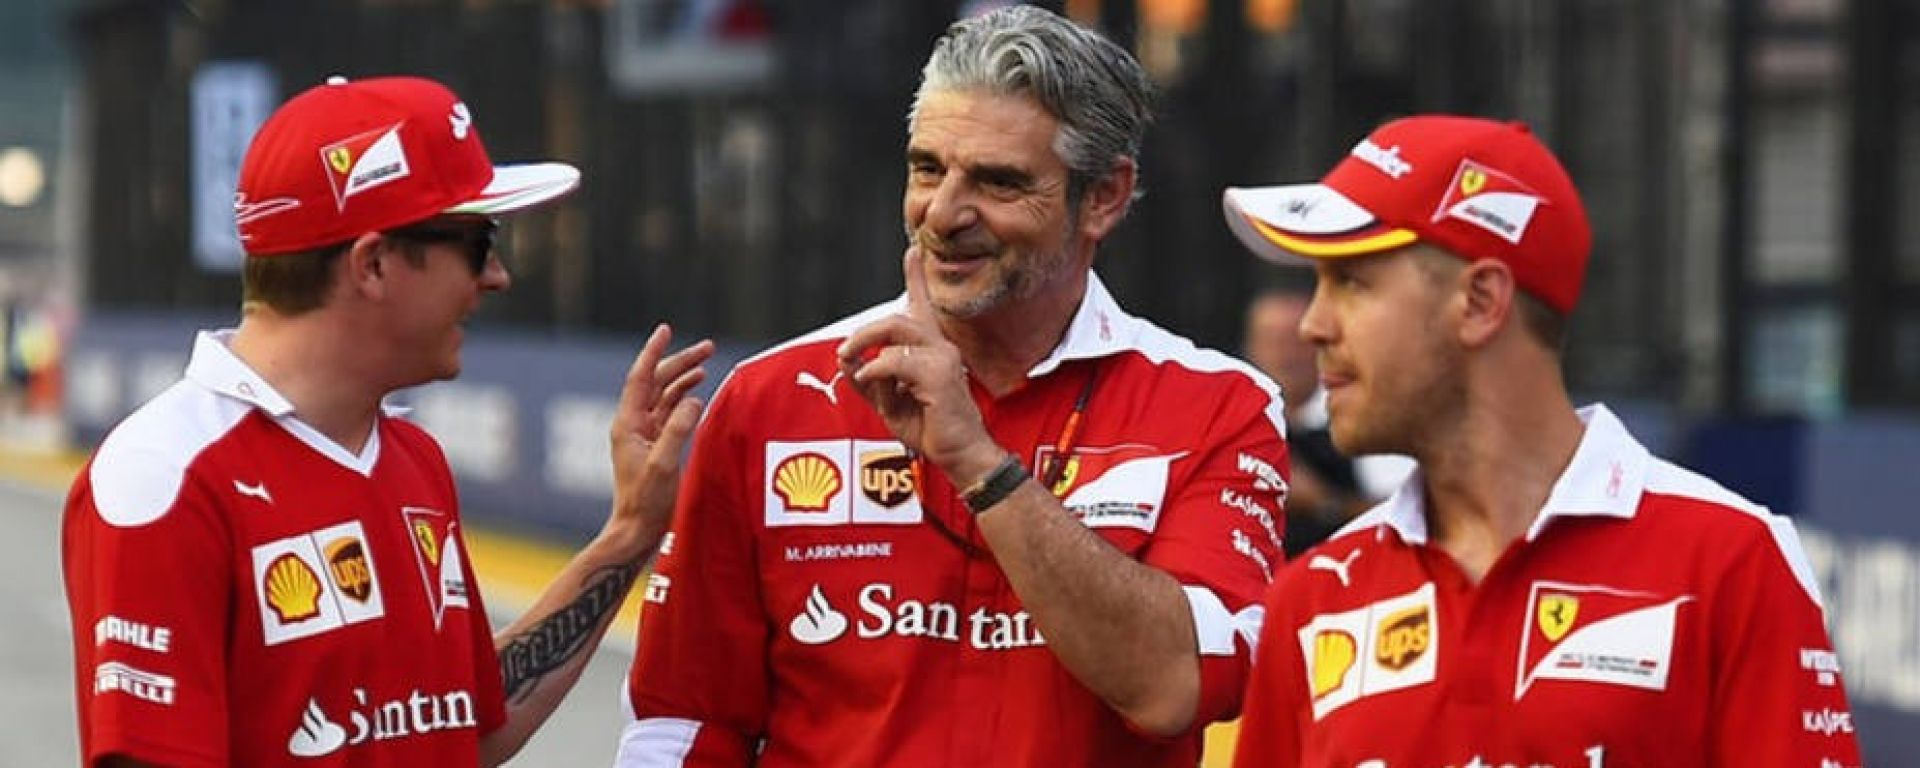 Maurizio Arrivabene con Raikkonen e Vettel